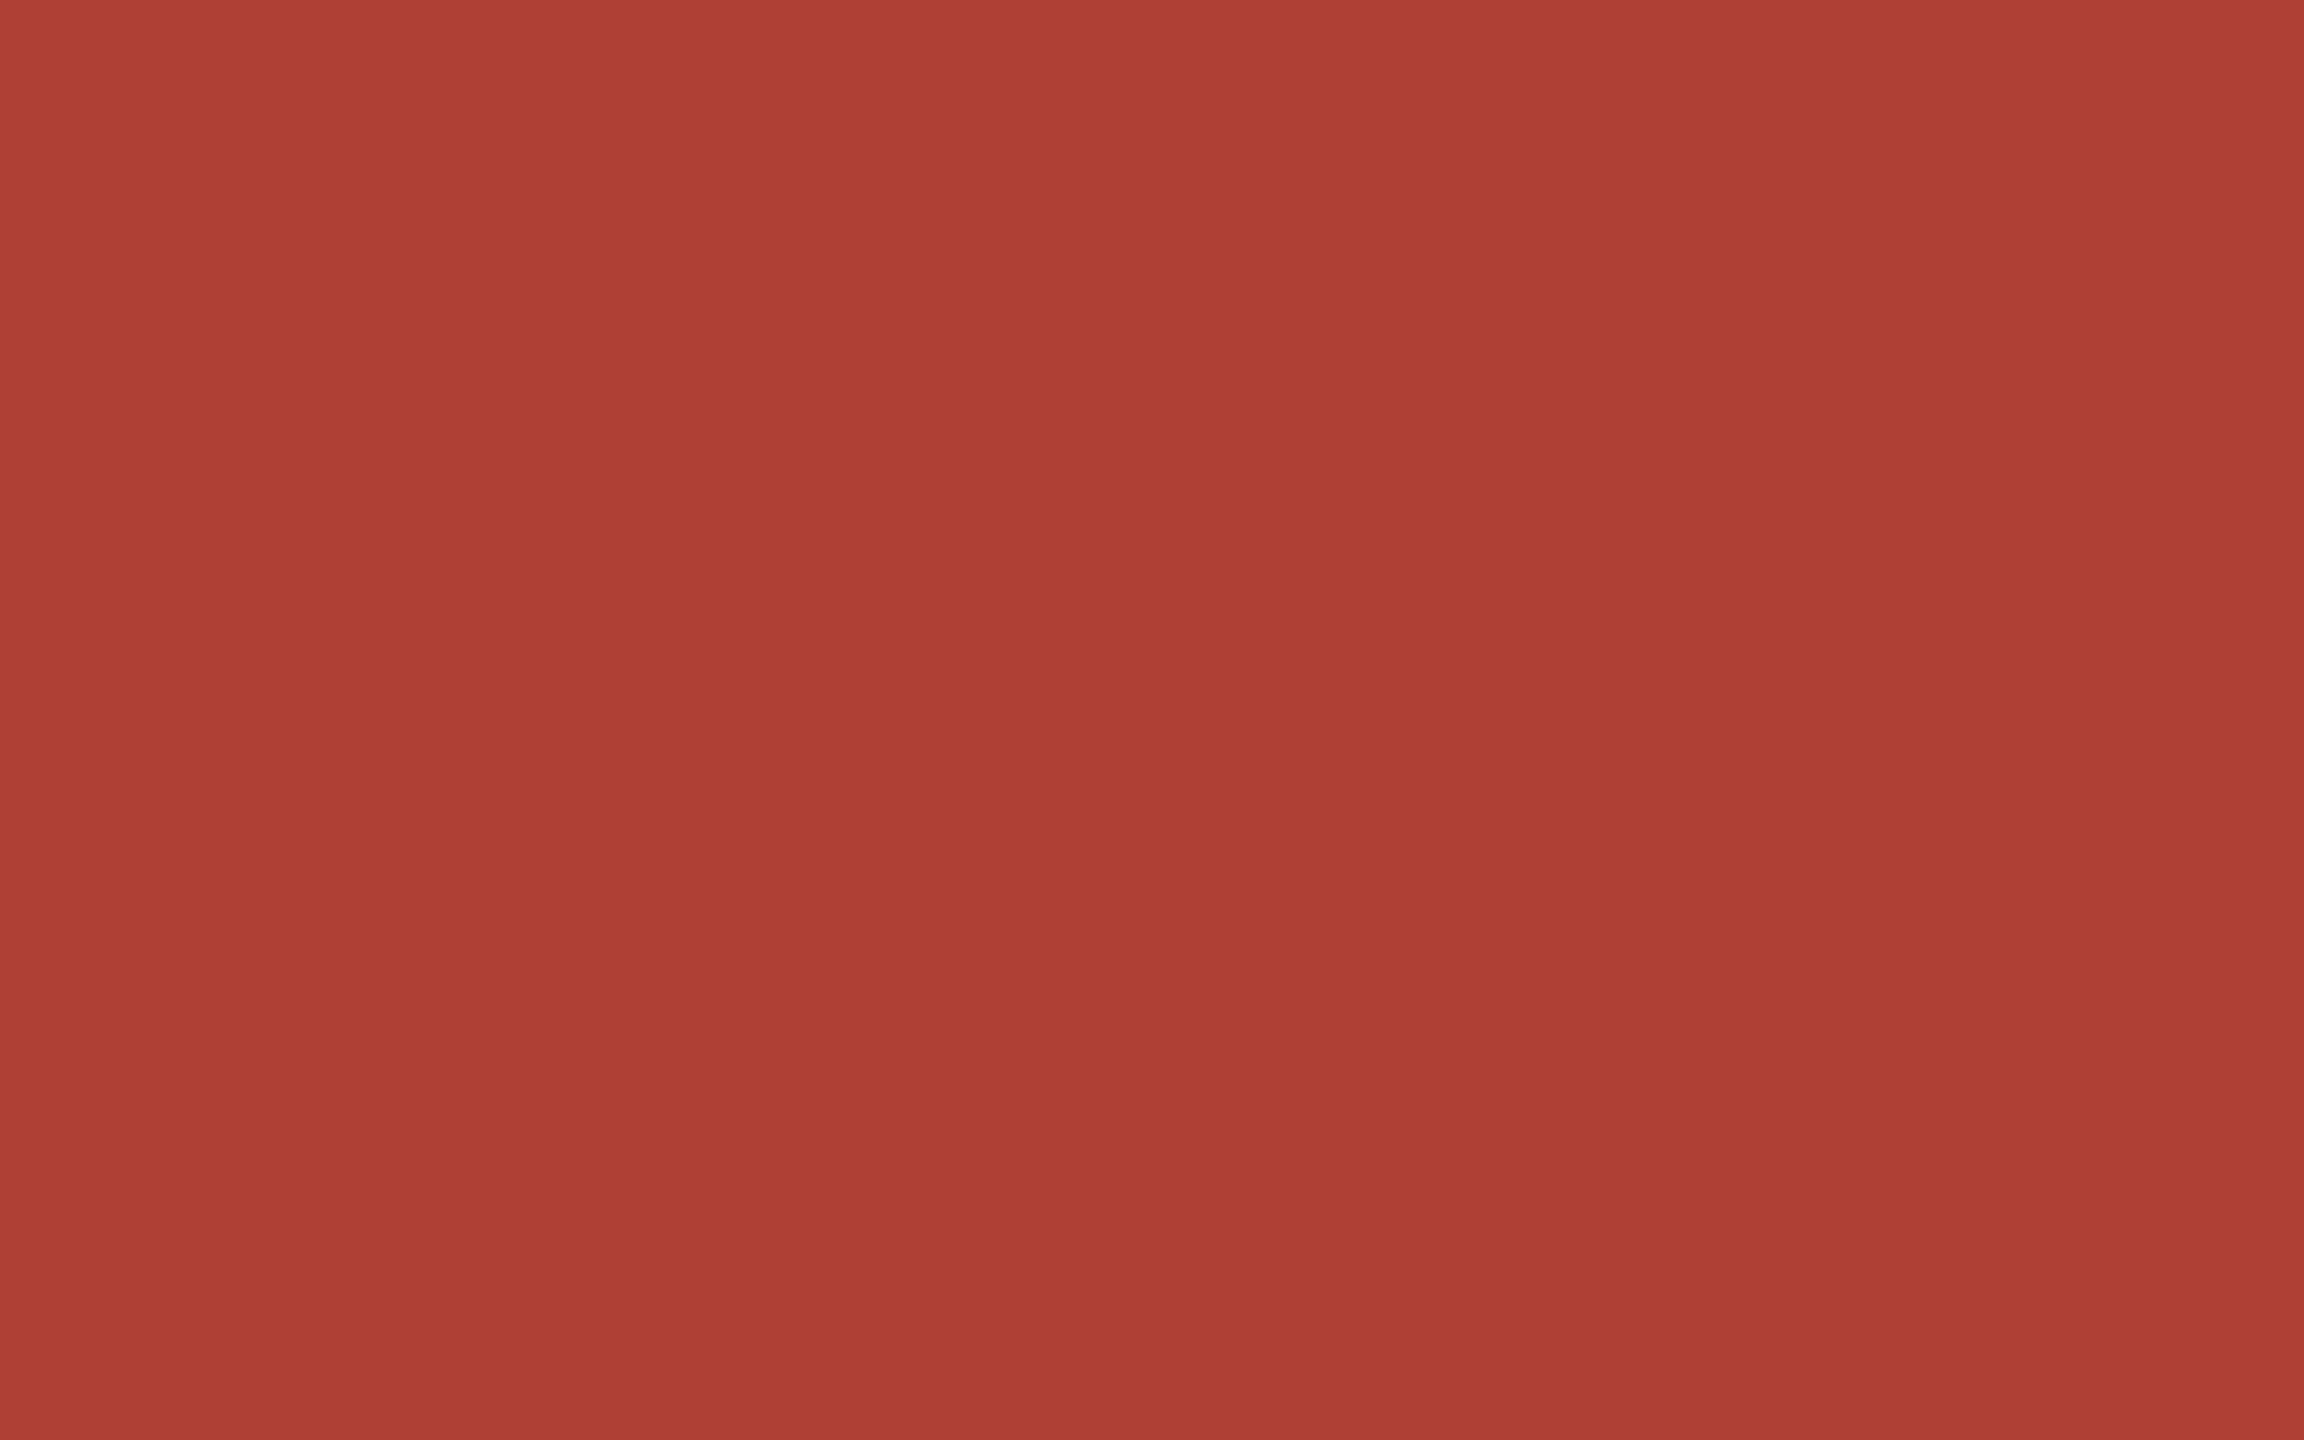 2304x1440 Medium Carmine Solid Color Background